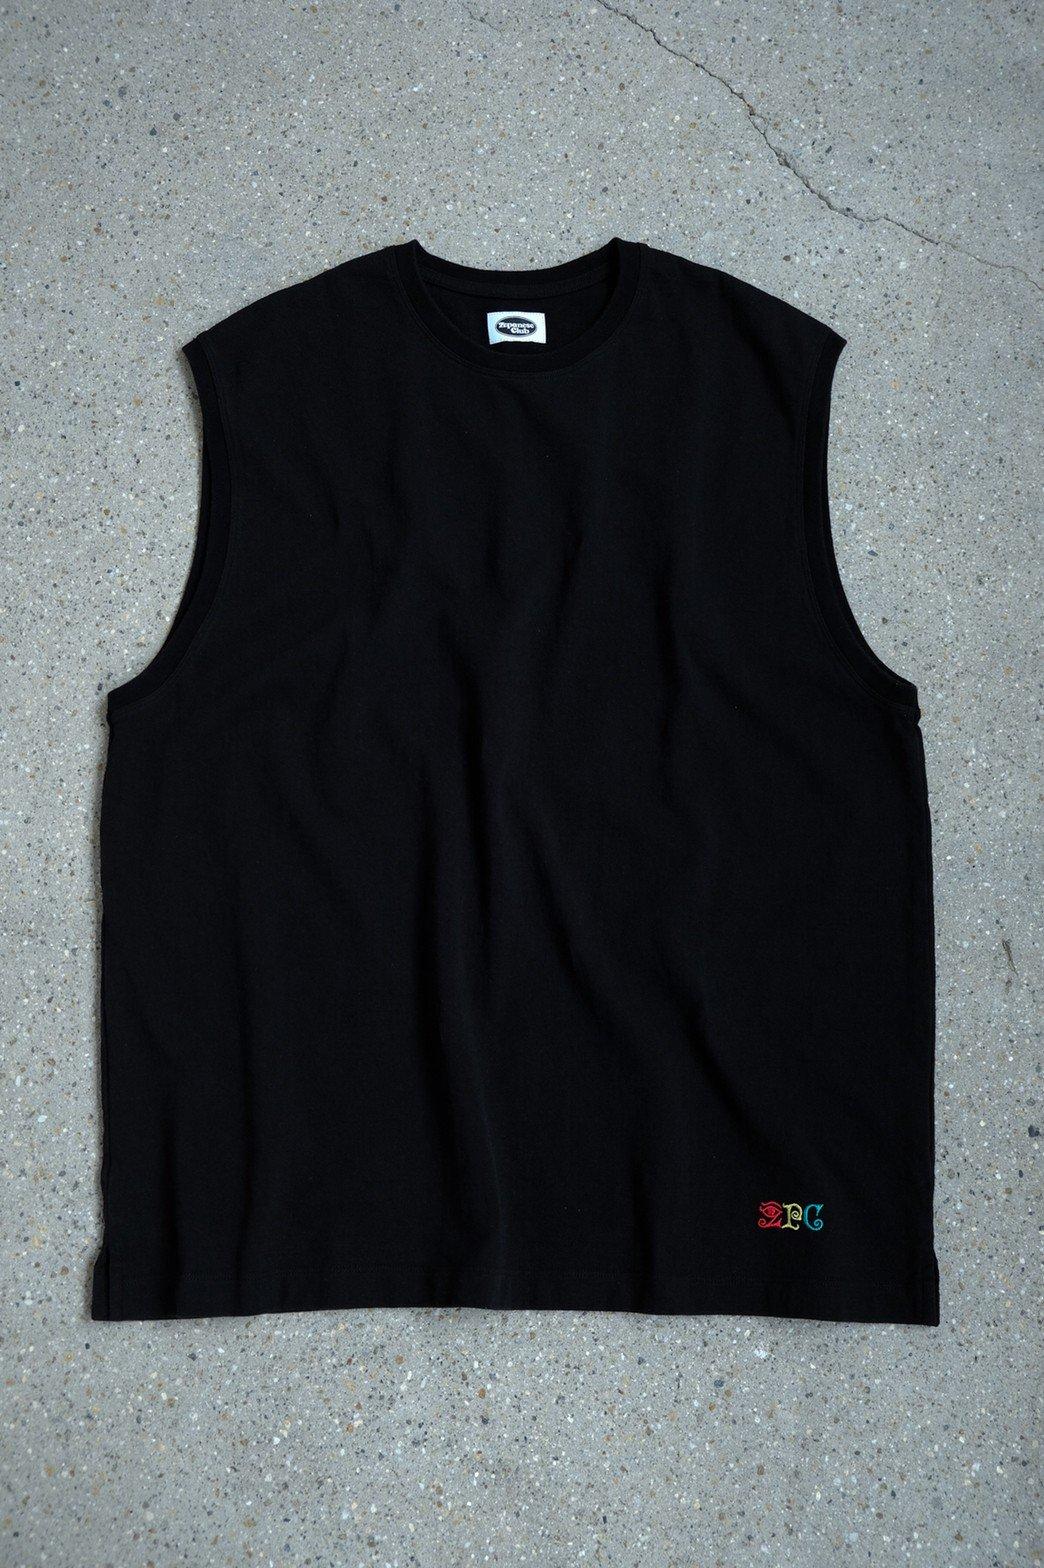 Zepanese Club / 刺繍 NO SLEEVE TEE BLACK